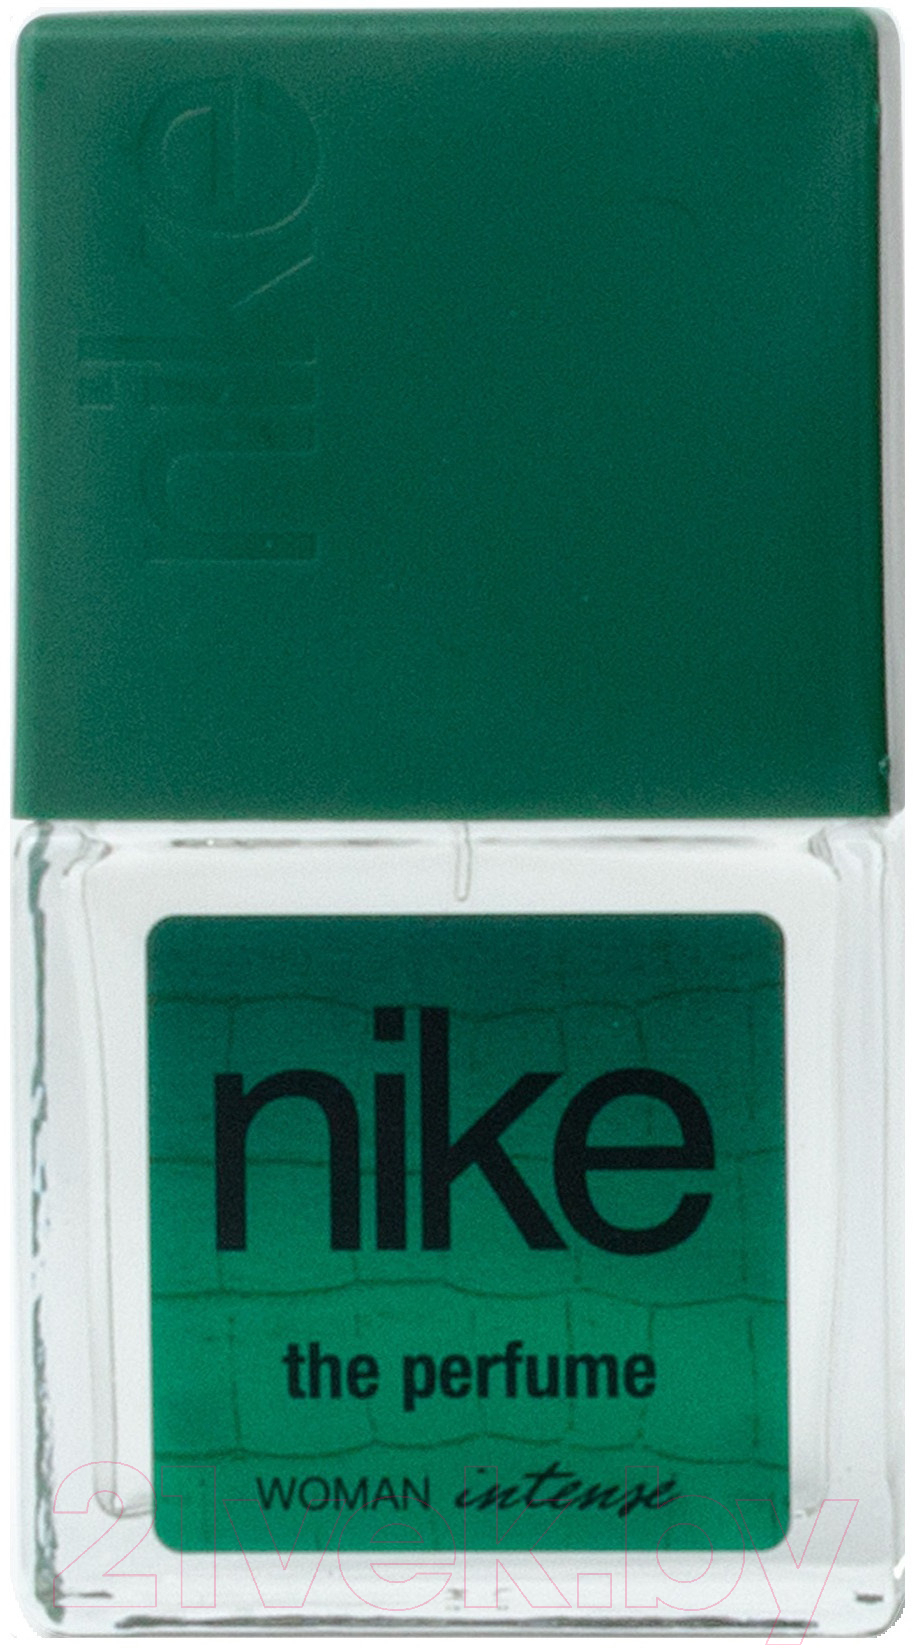 Купить Туалетная вода Nike Perfumes, The Perfume Woman Intense (30мл), Испания